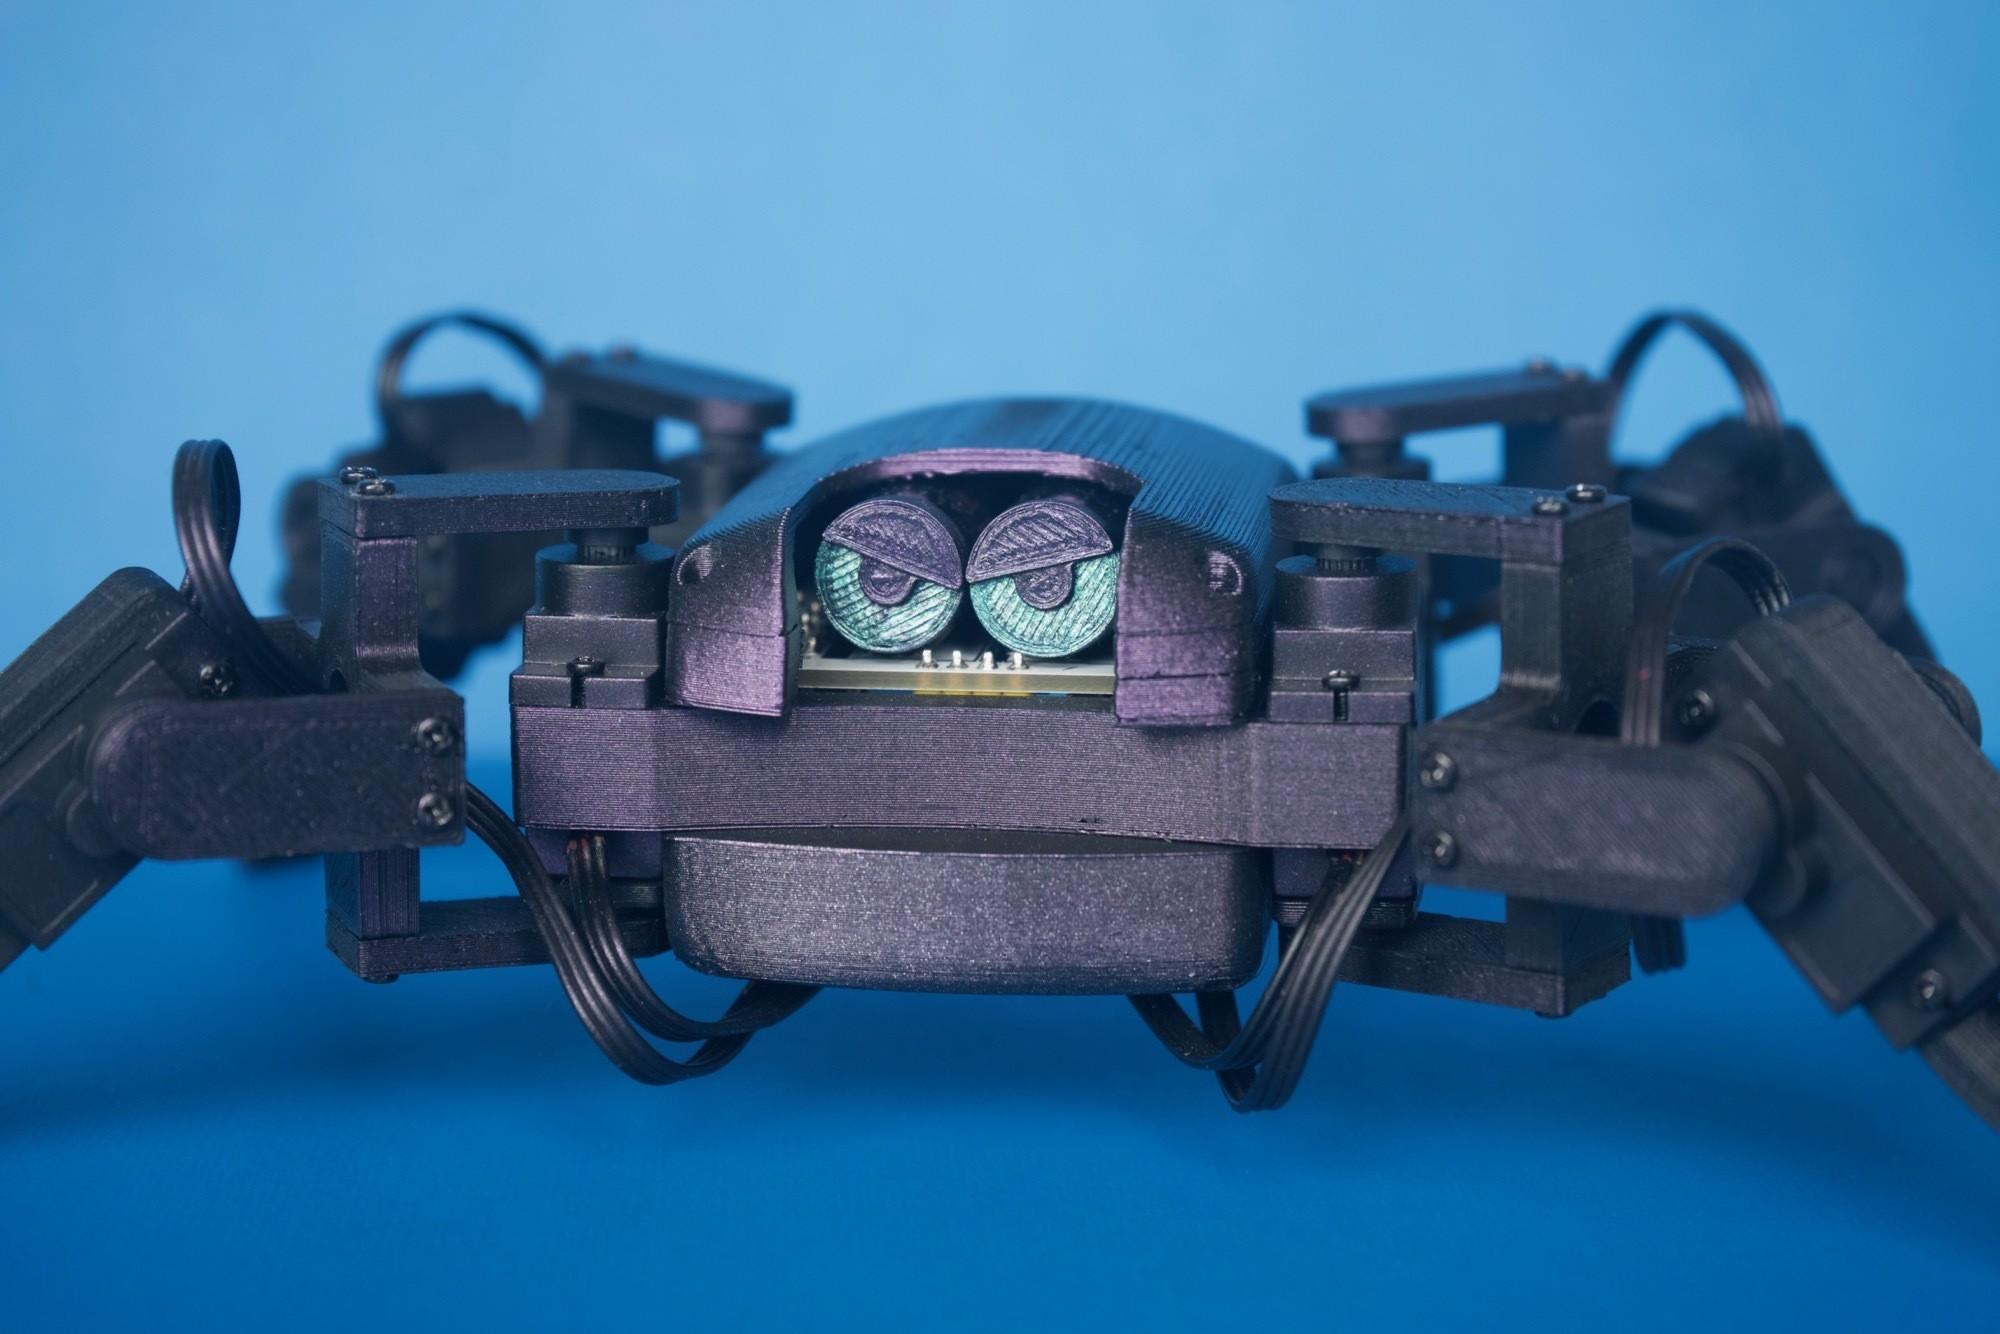 Q1mini002.jpg Download free STL file Q1 mini Quadruped Robot 2.0 (Designed by Jason Workshop) • 3D printing design, Jason8866